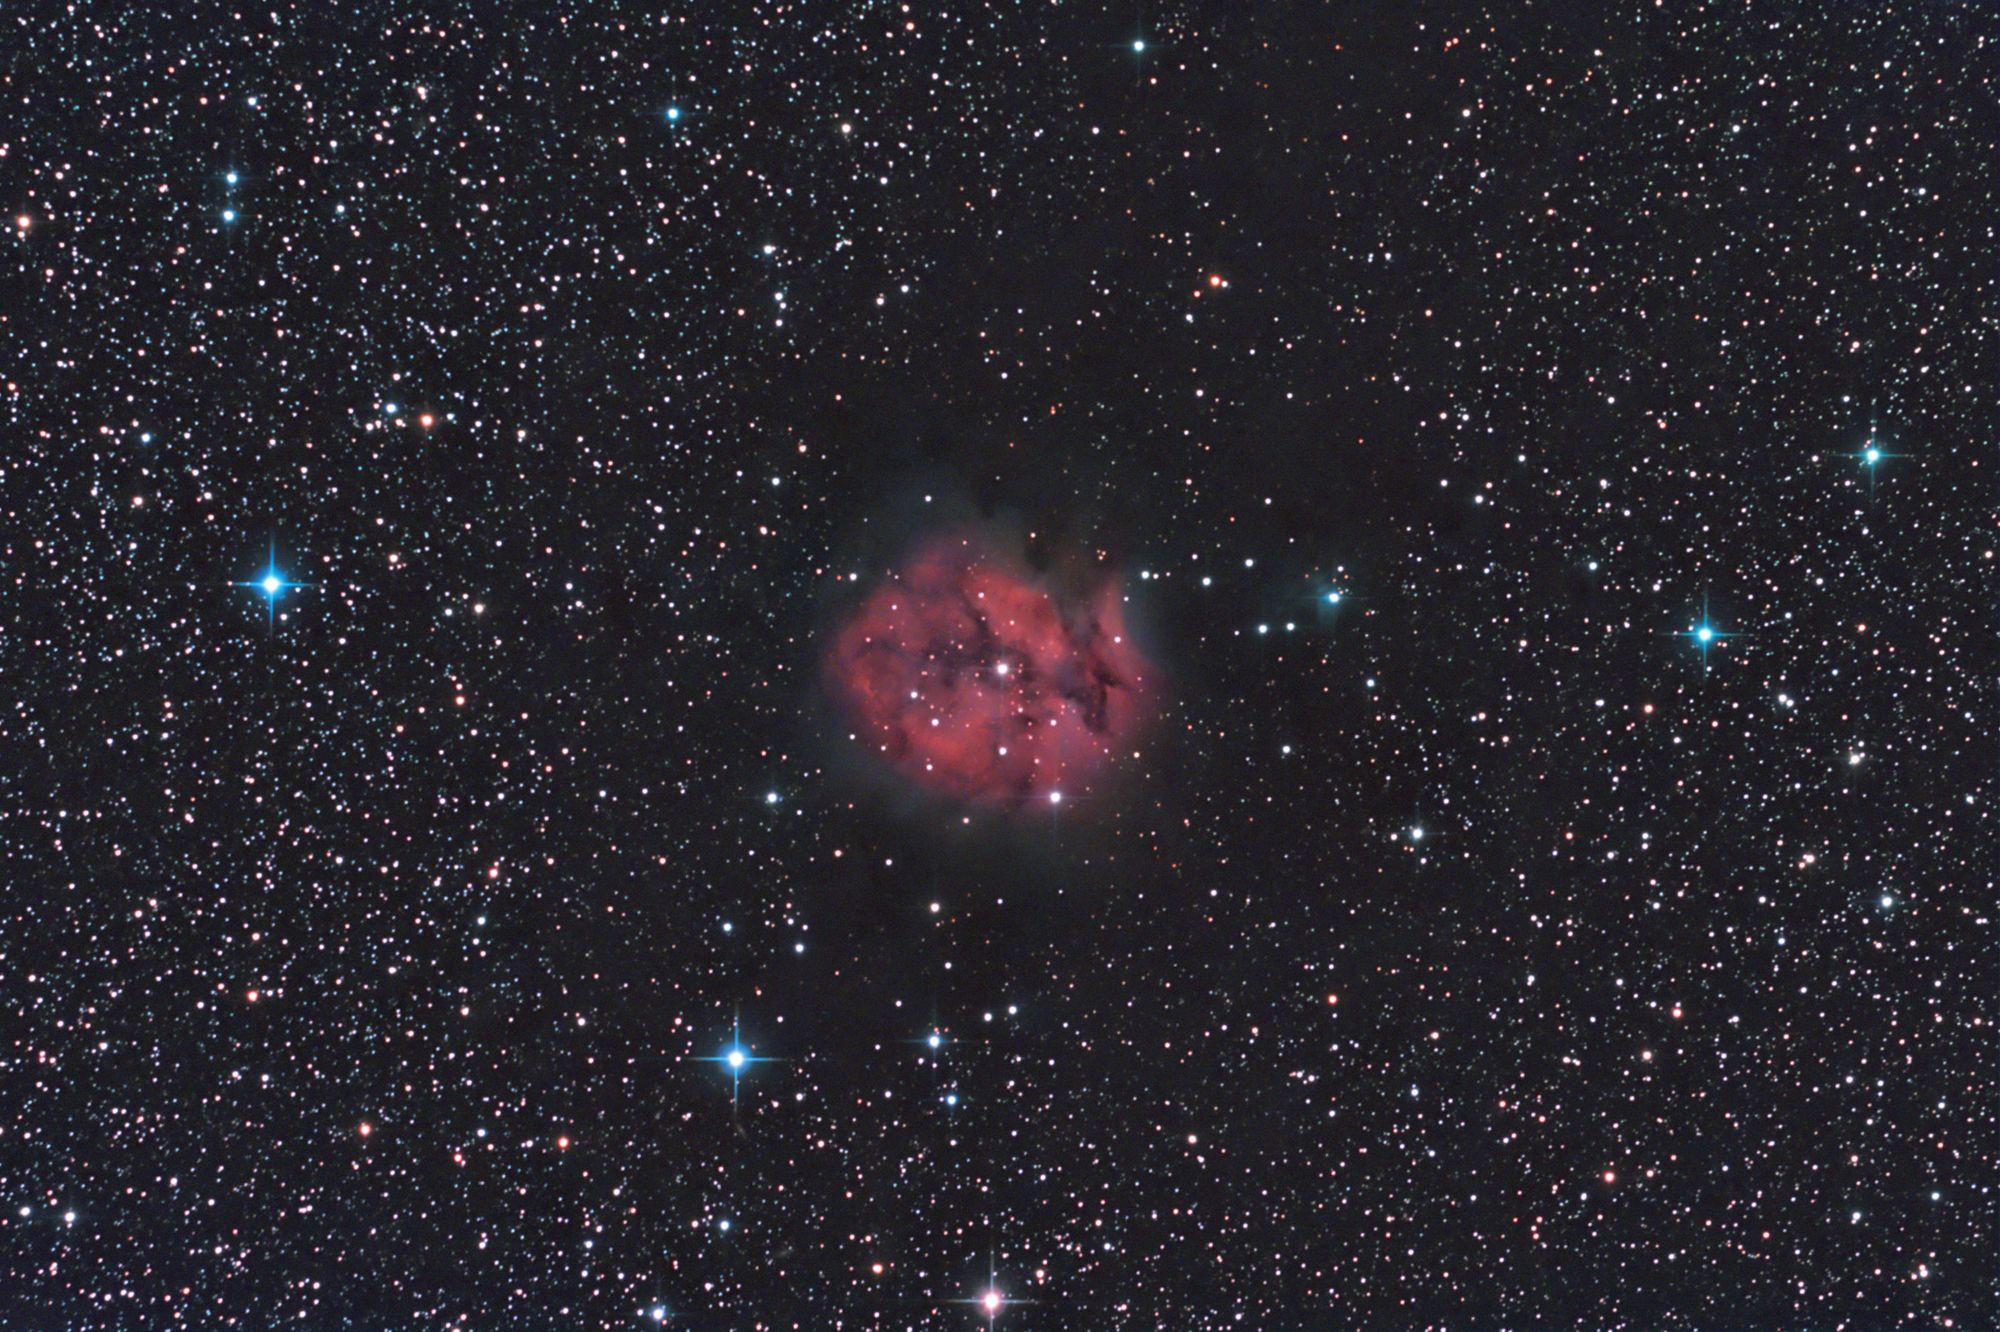 IC 5146 - The Cocoon Nebula